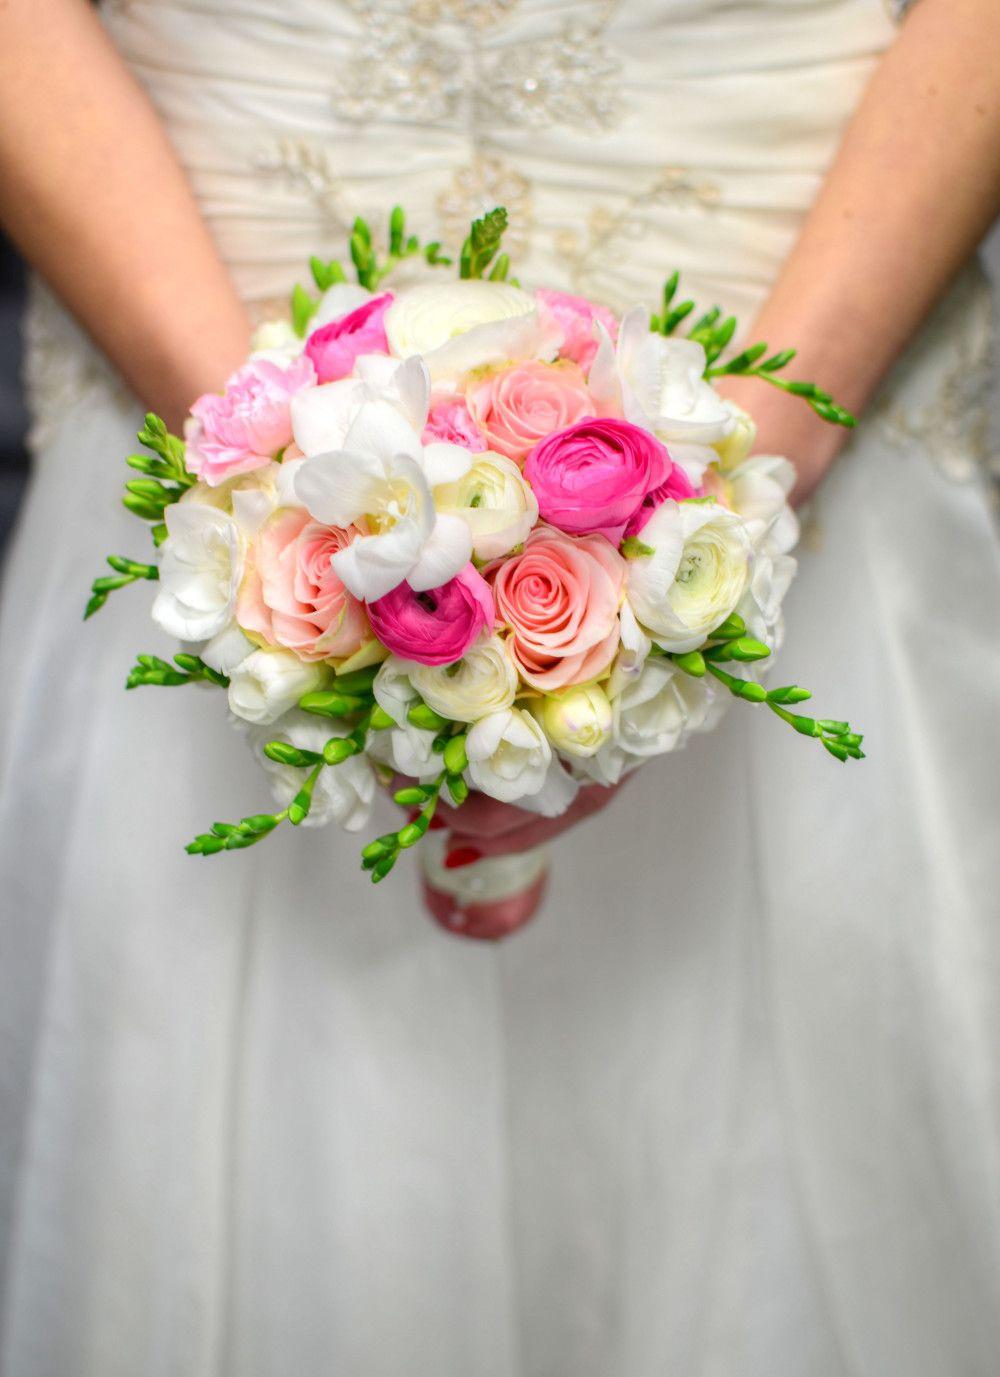 Bukiety Slubne Torun I Okolice Kwiaciarnia Green Place Bouquet De Mariage Bouquet Mariee Mariage